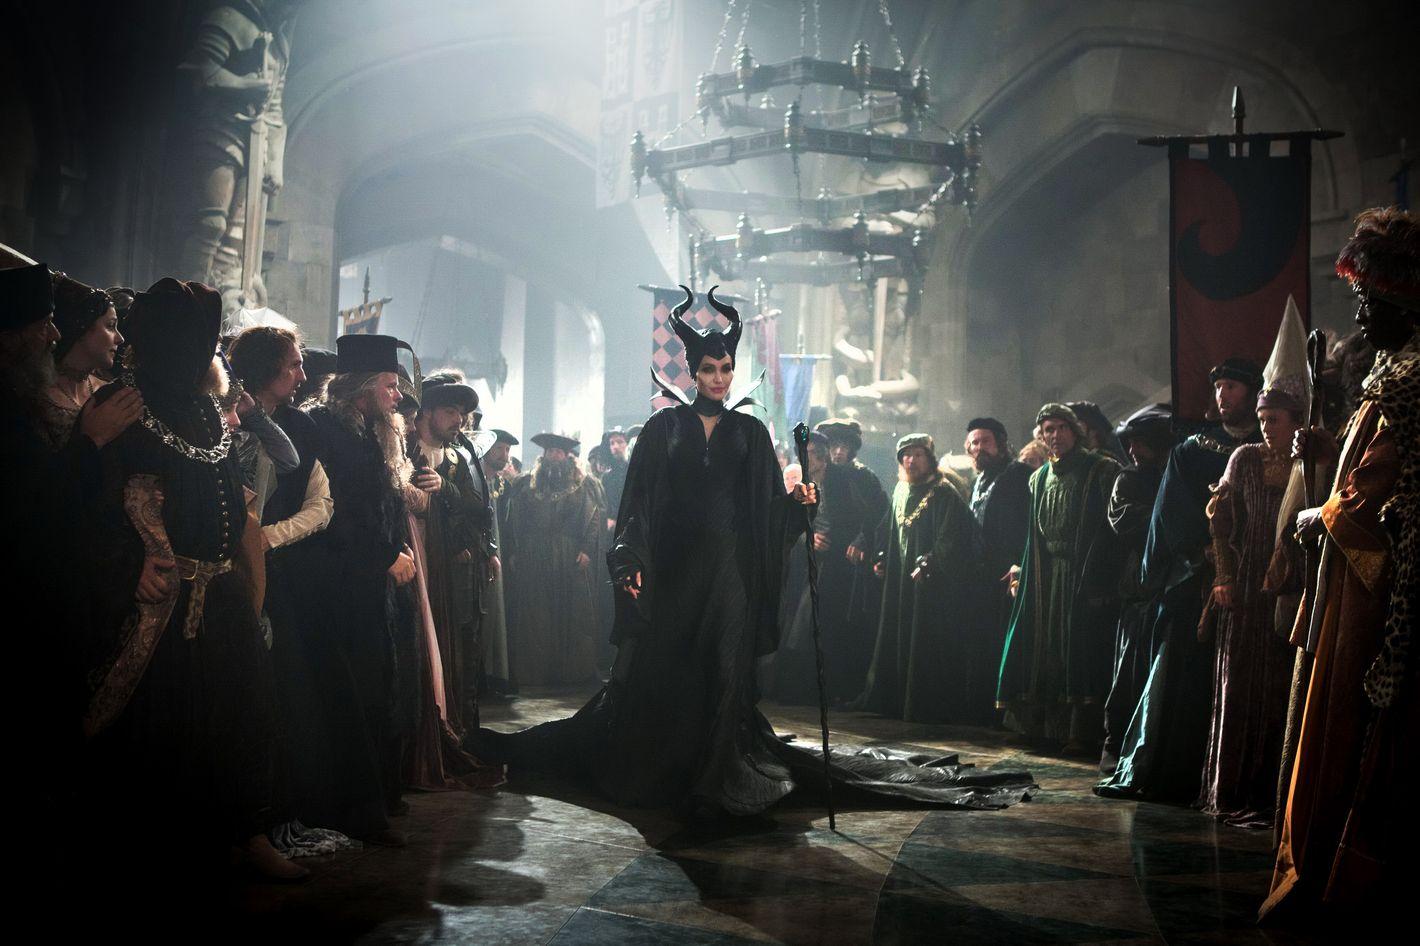 Ebiri on Maleficent: Don't Let Her Be Misunderstood